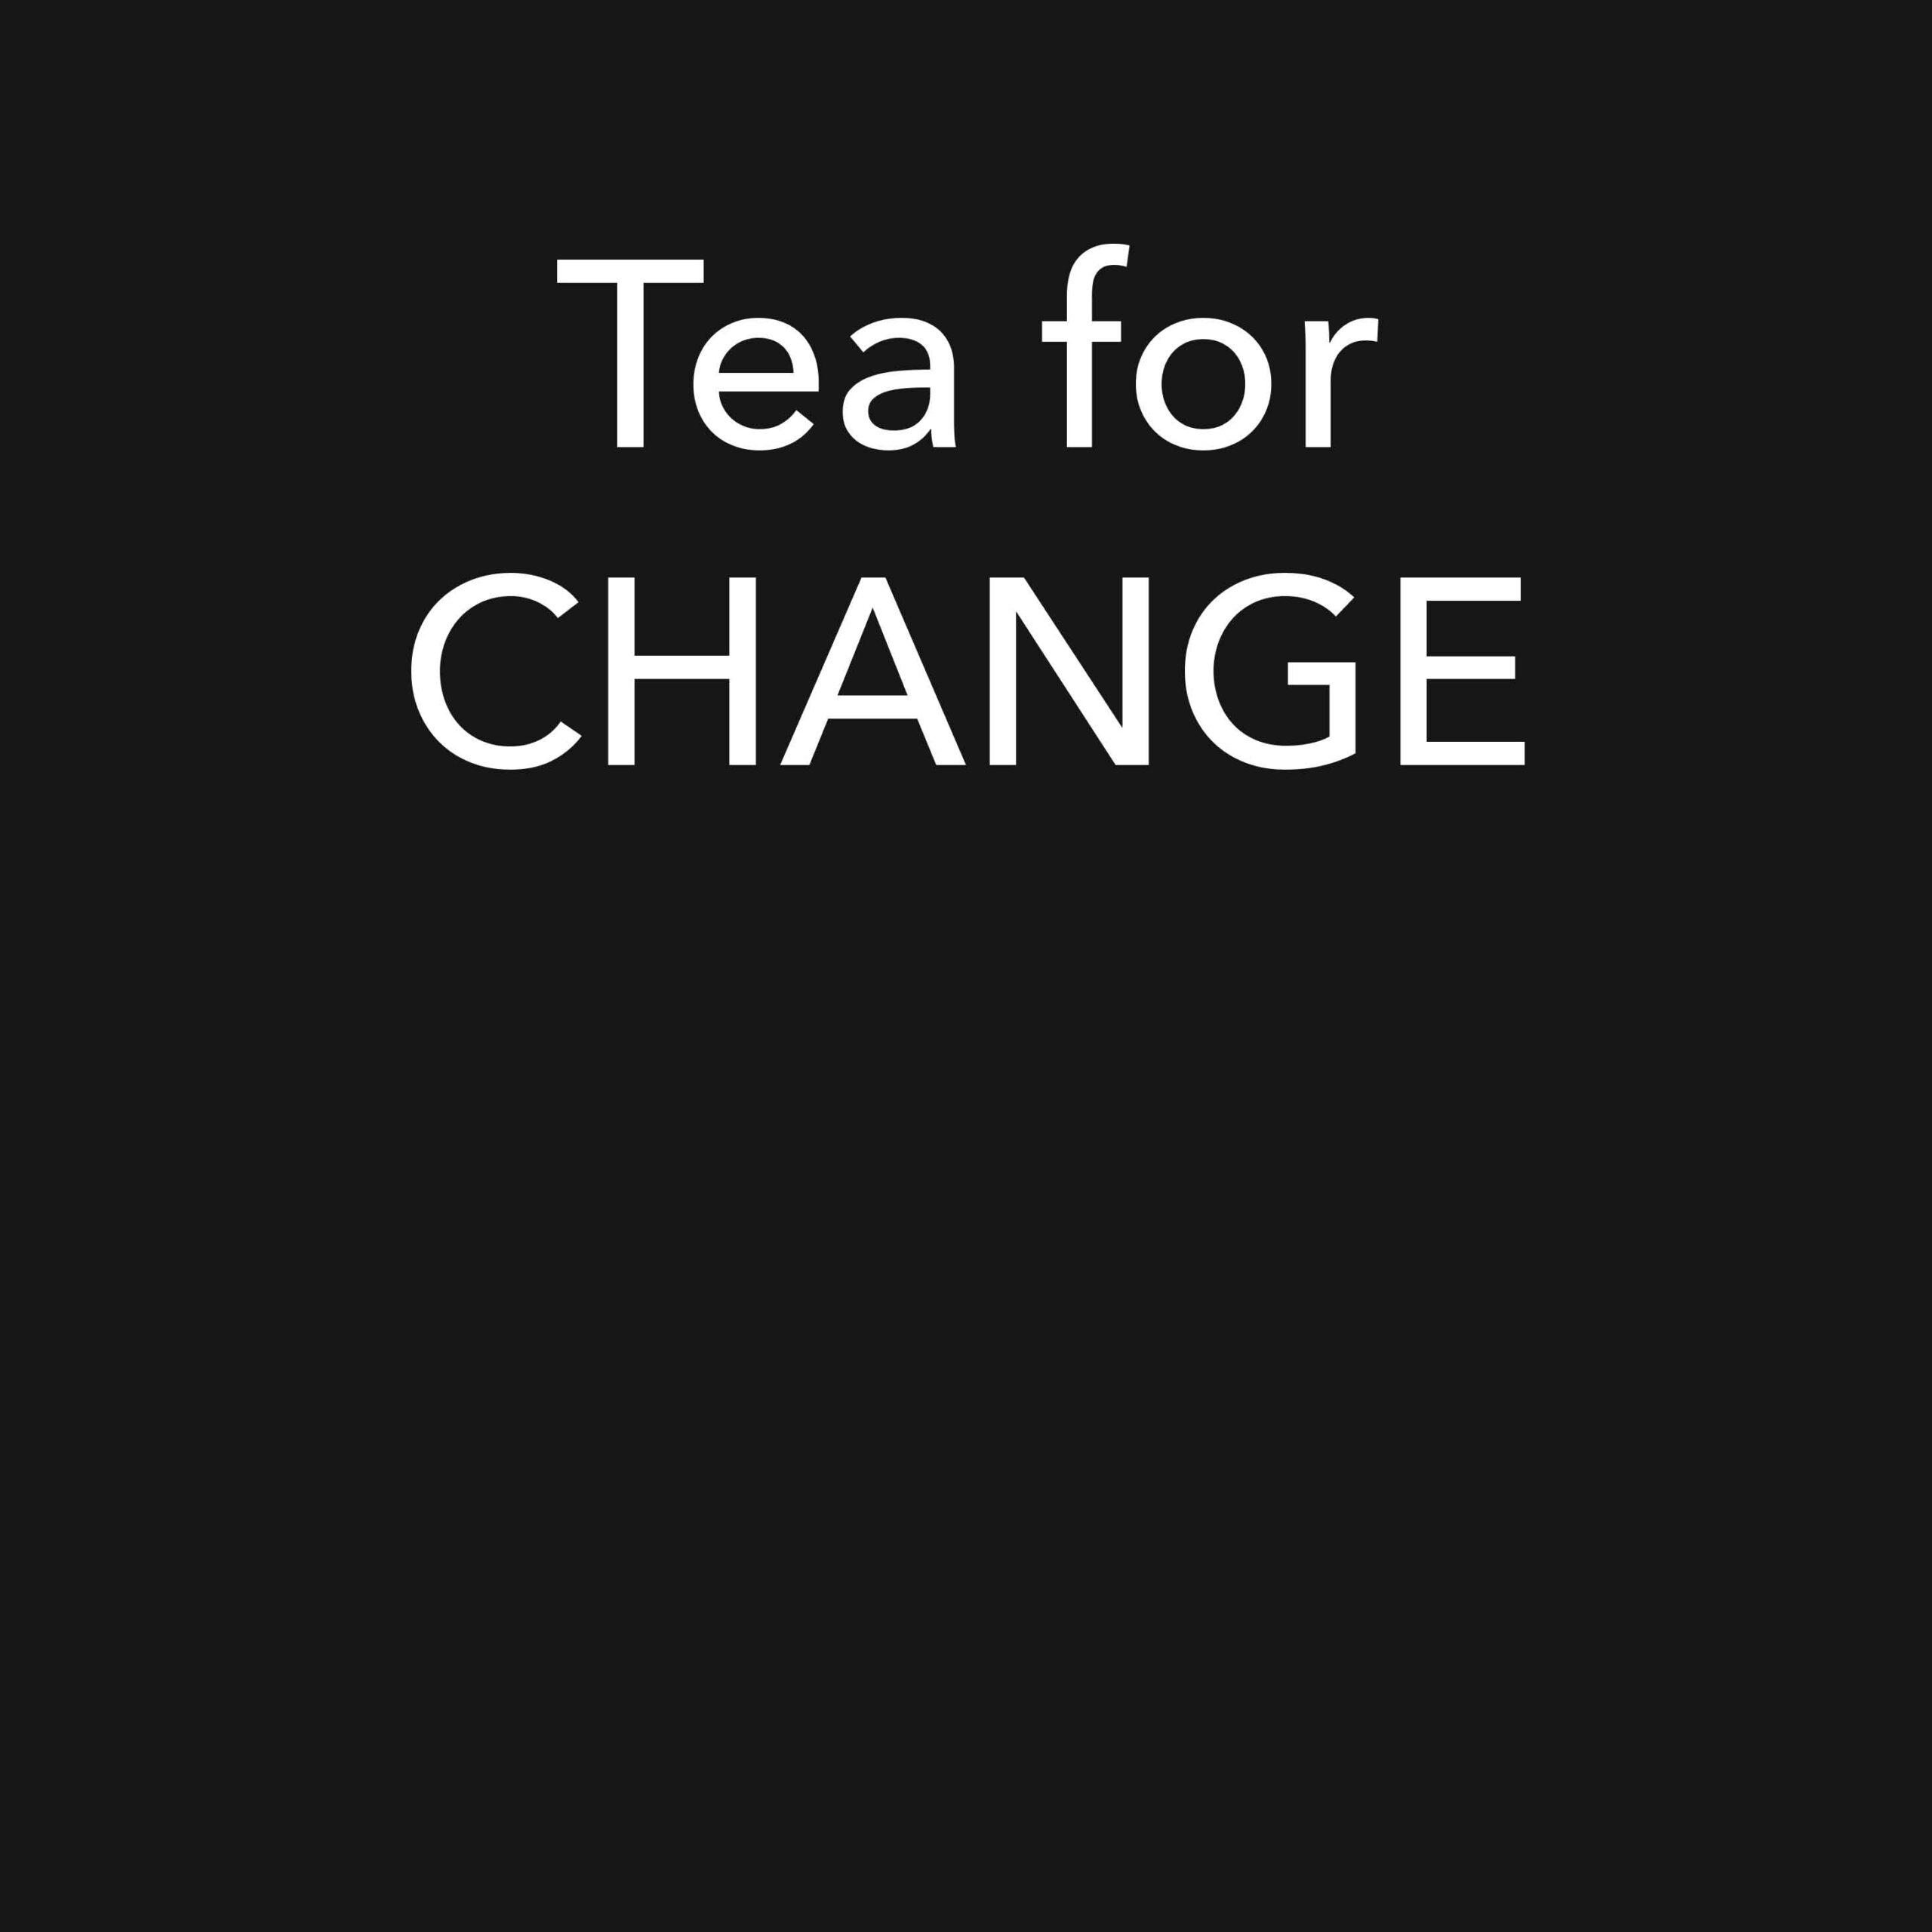 Tea for Change